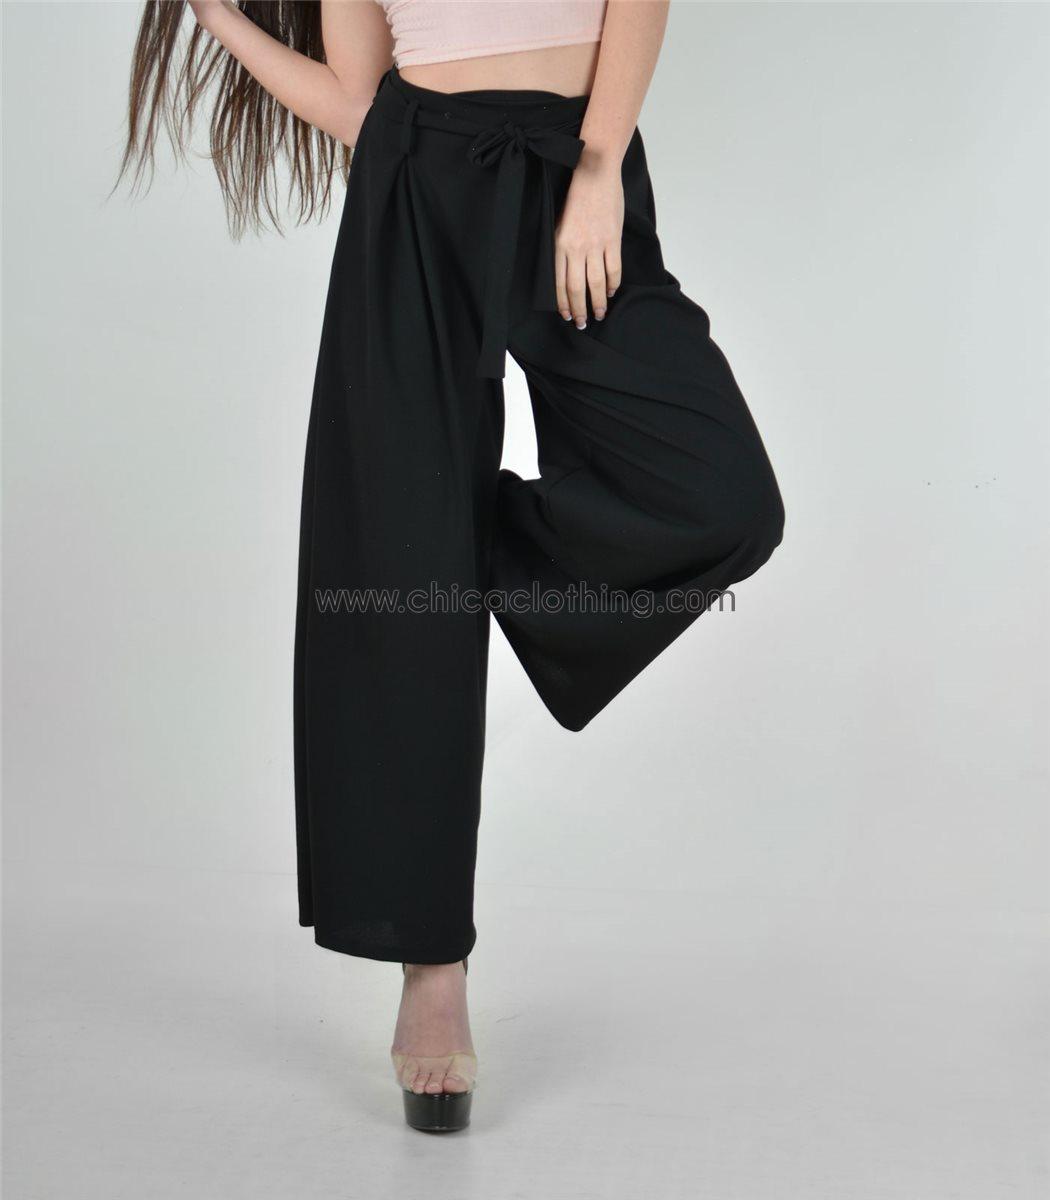 5134a3774478 Γυναικεία ψηλόμεση παντελόνα με ζώνη (Μαύρο)